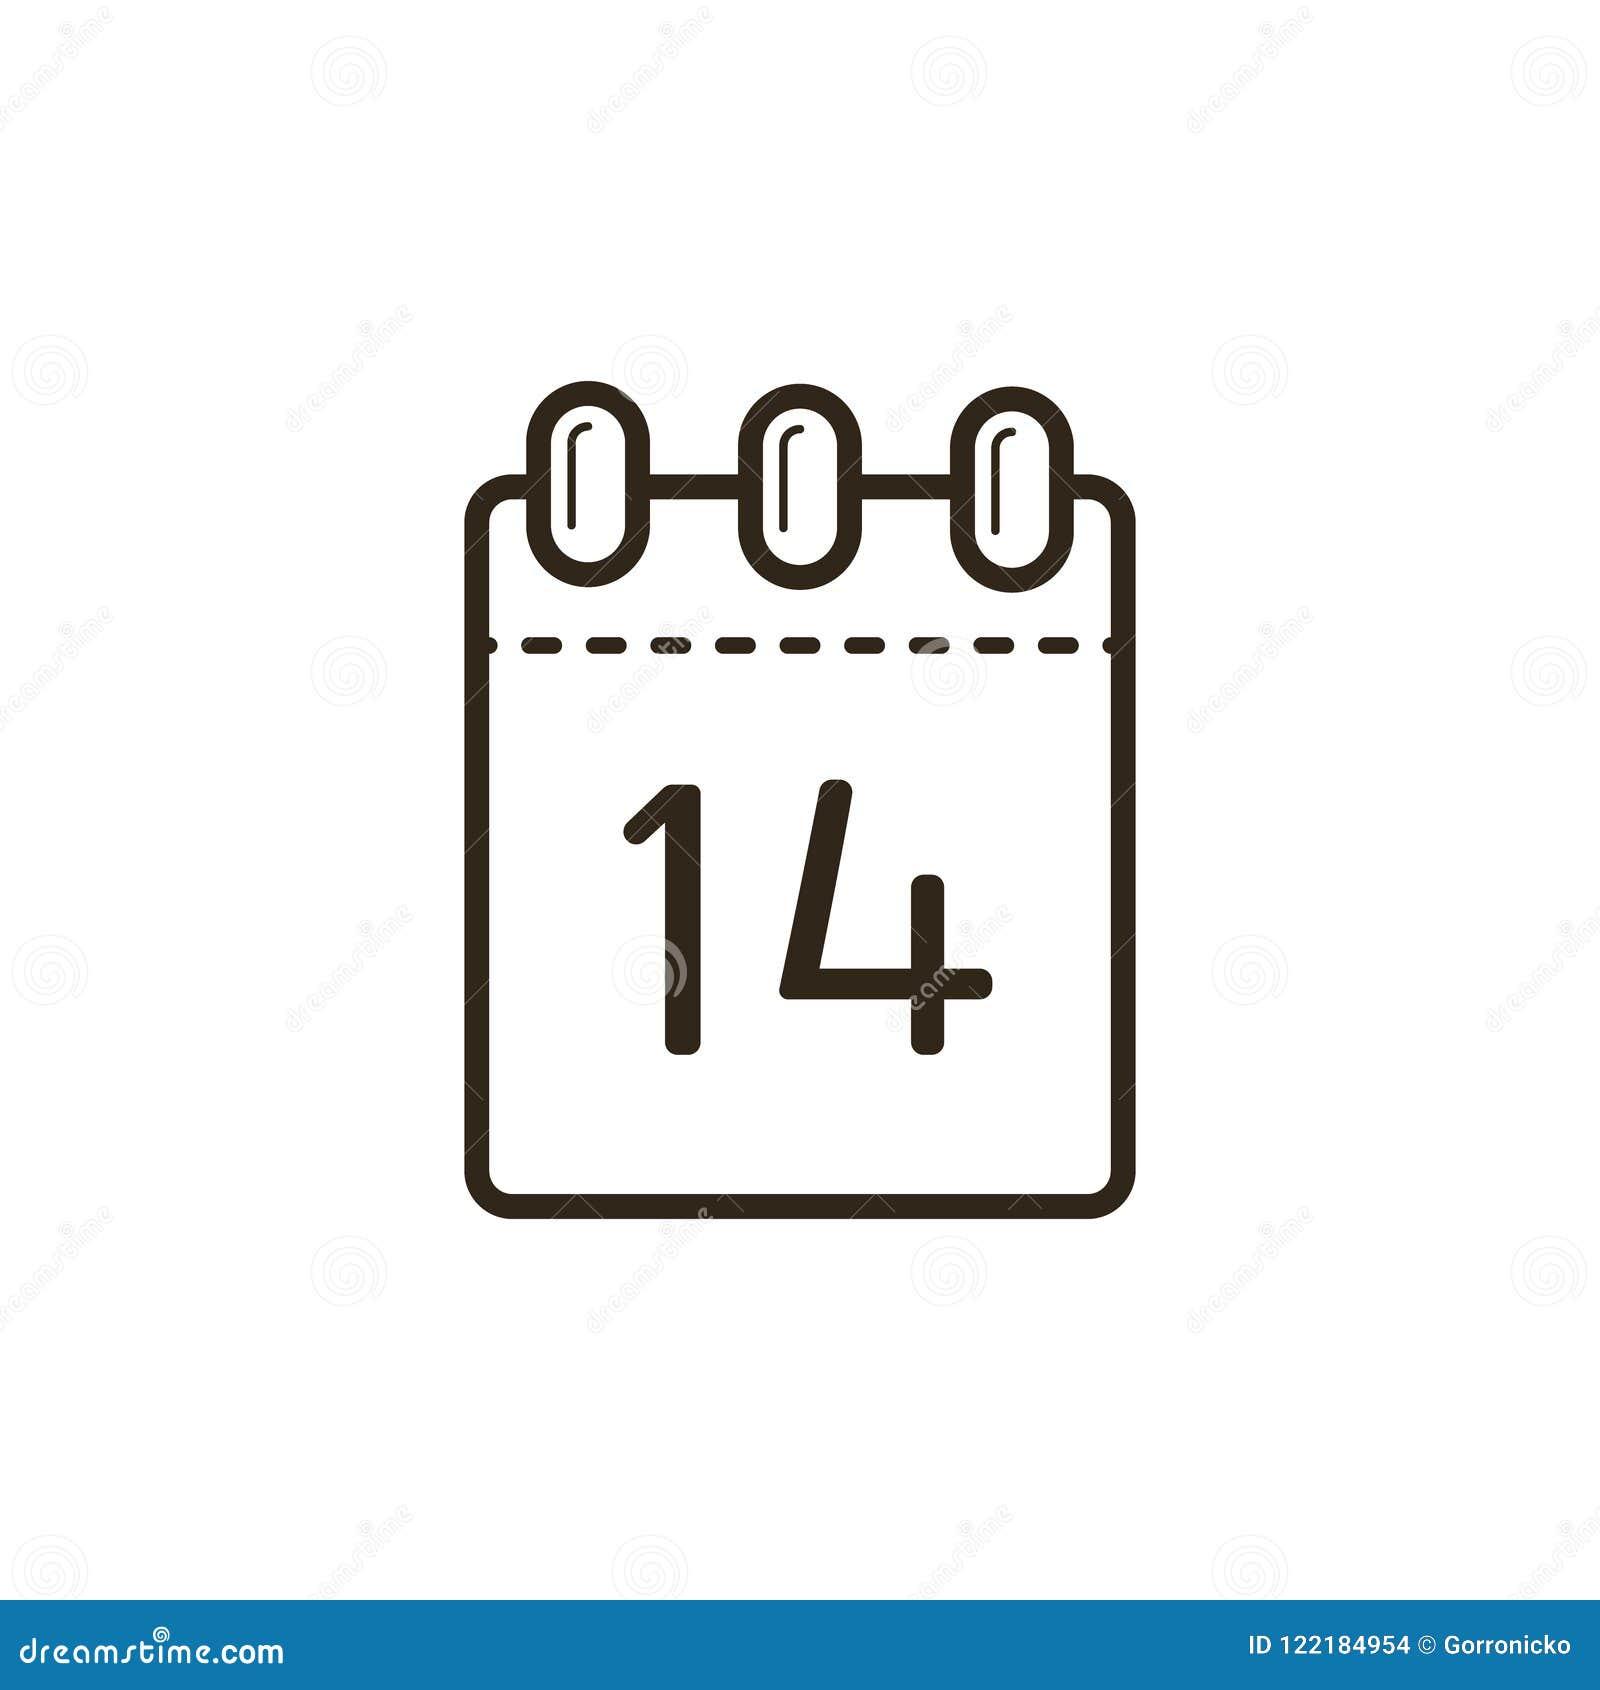 Linje konstsymbol av reva-avkalendern med det fjortonde på arket